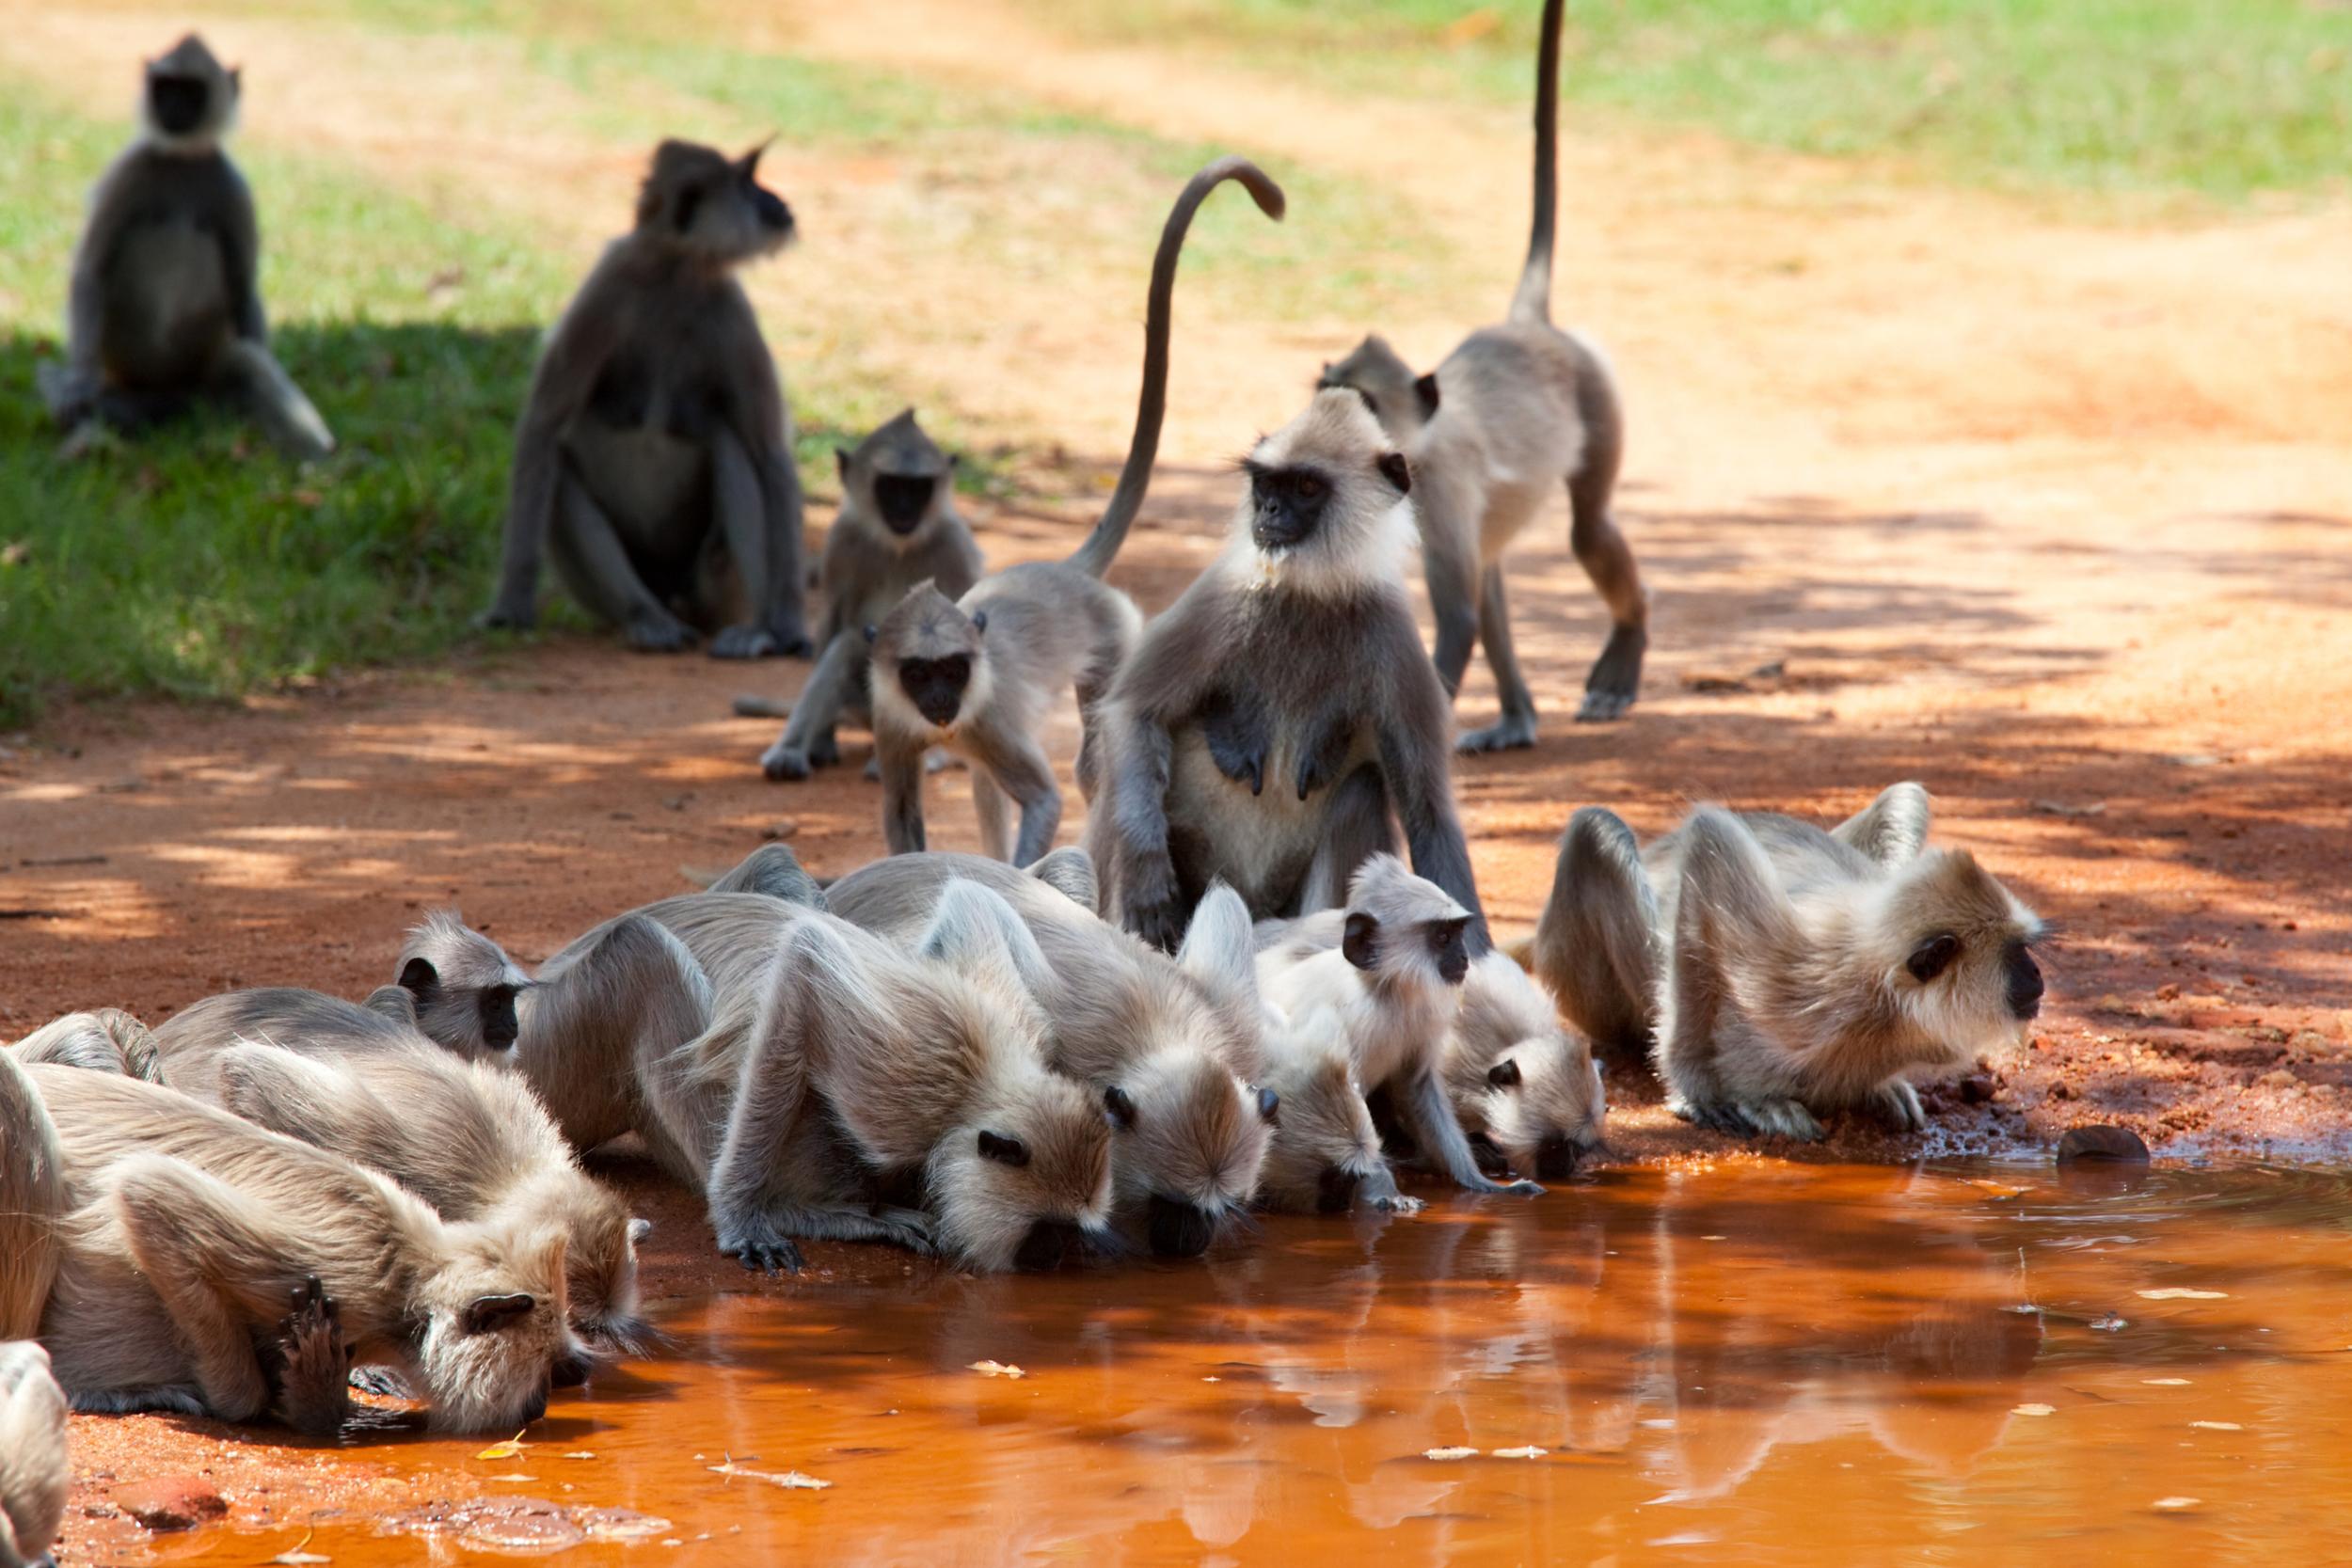 invite-to-paradise-sri-lanka-honeymoon-holiday-wildlife-safari-monkeys.jpg